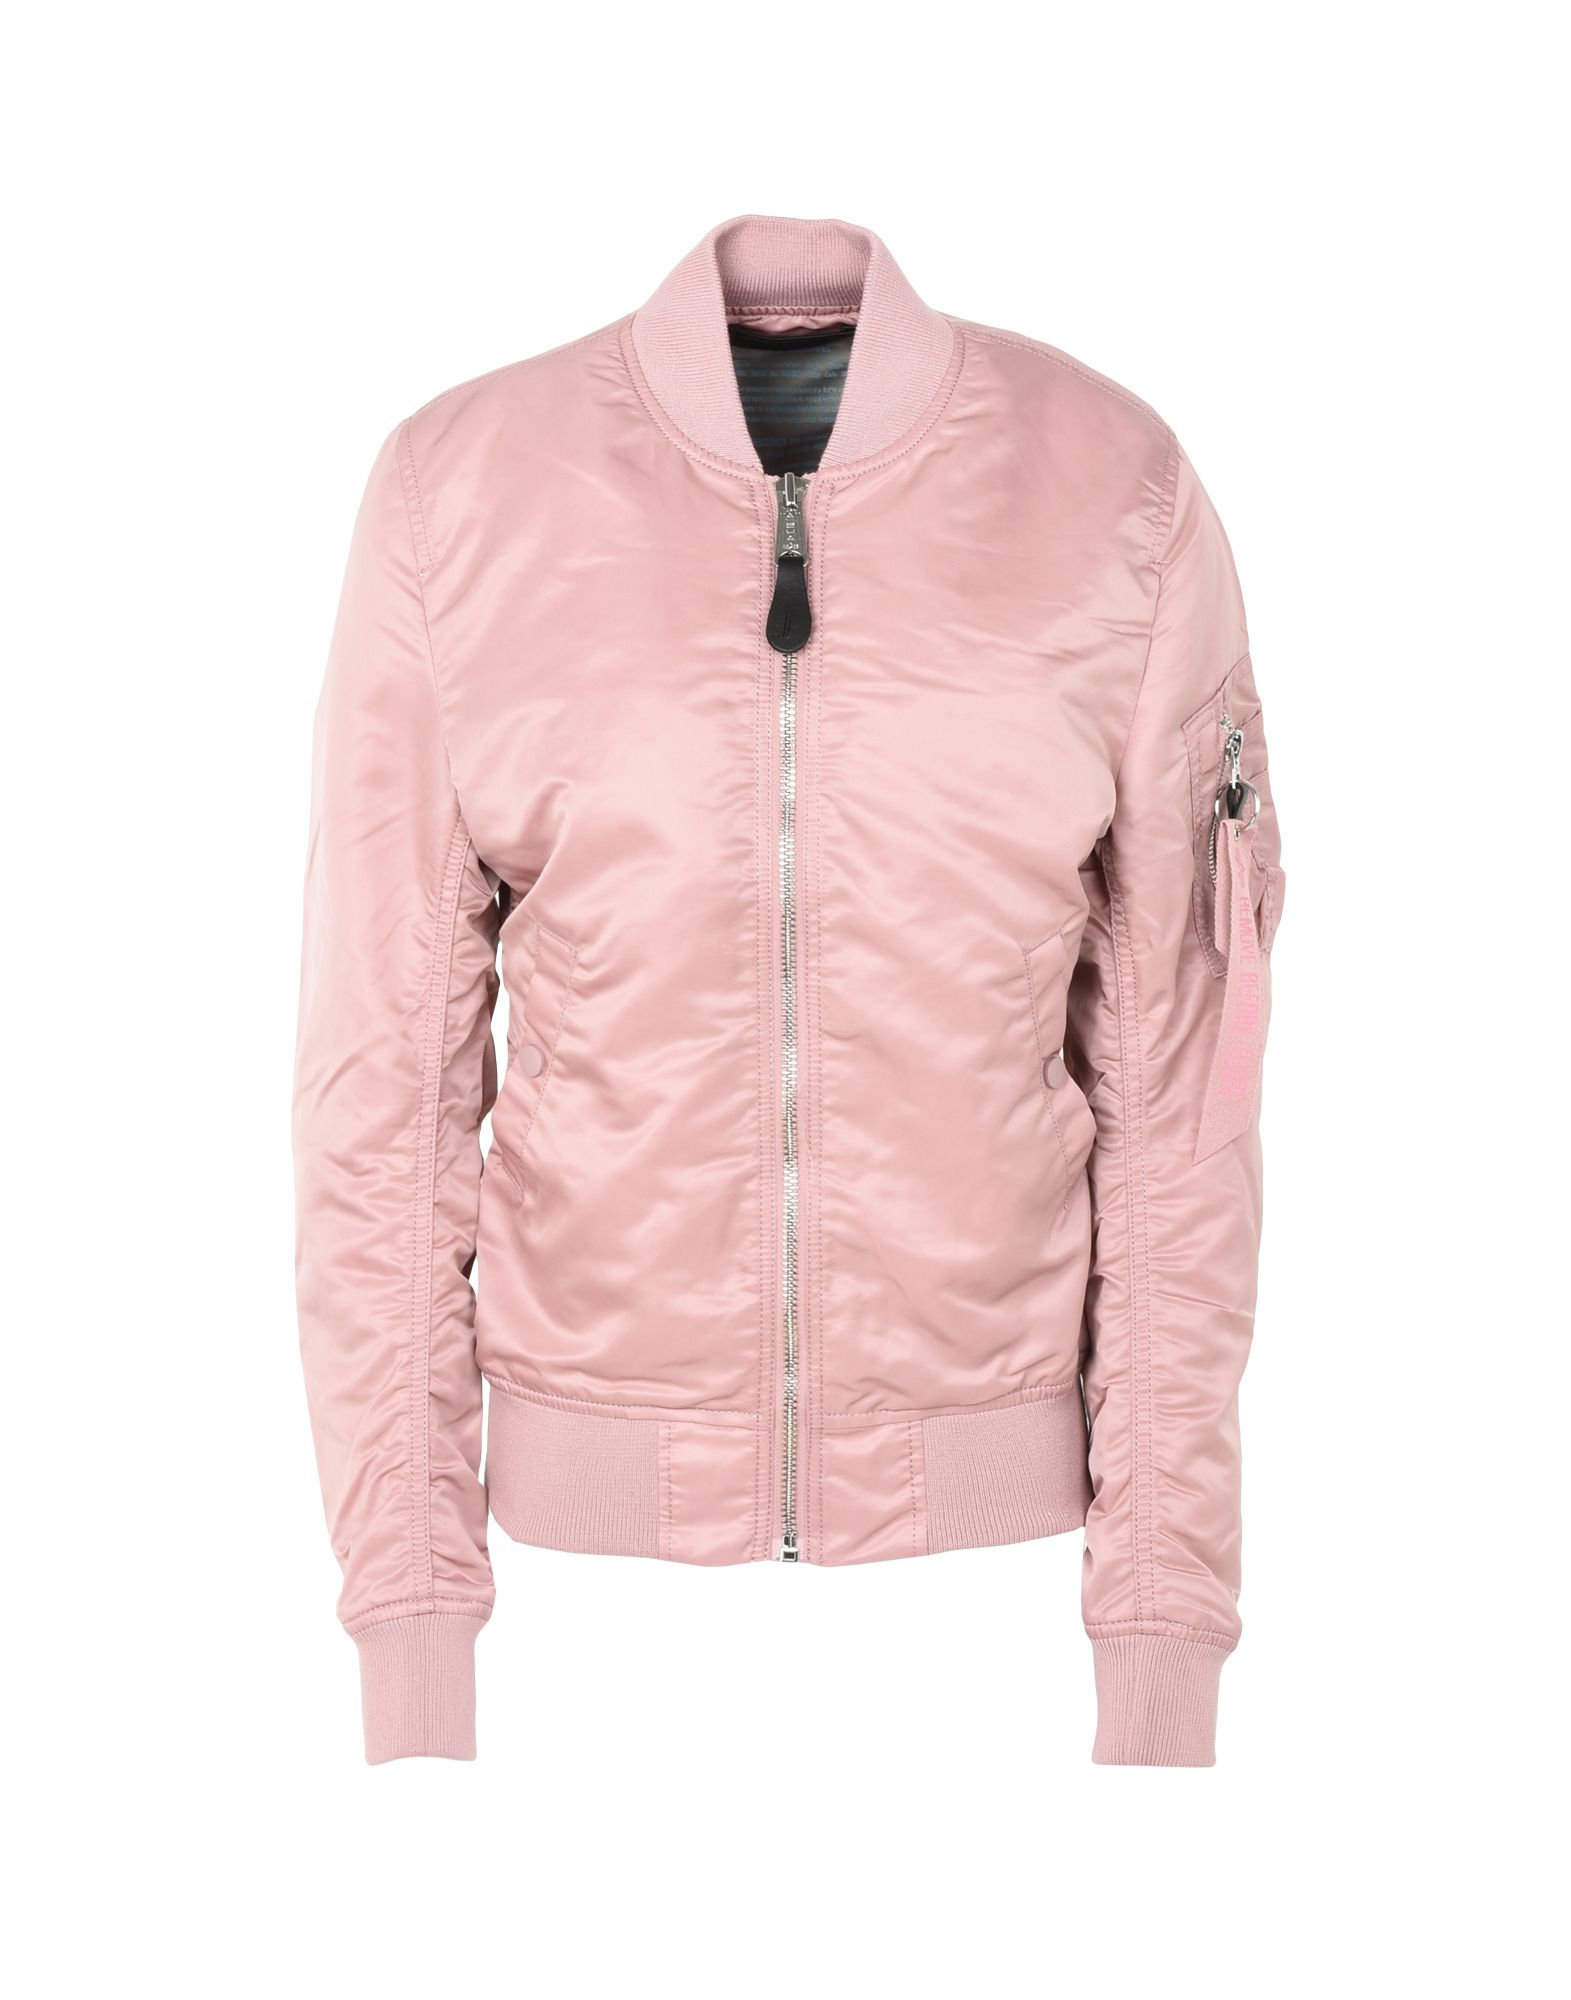 ALPHA INDUSTRIES INC. Damen Jacke Farbe Rosa Größe 3